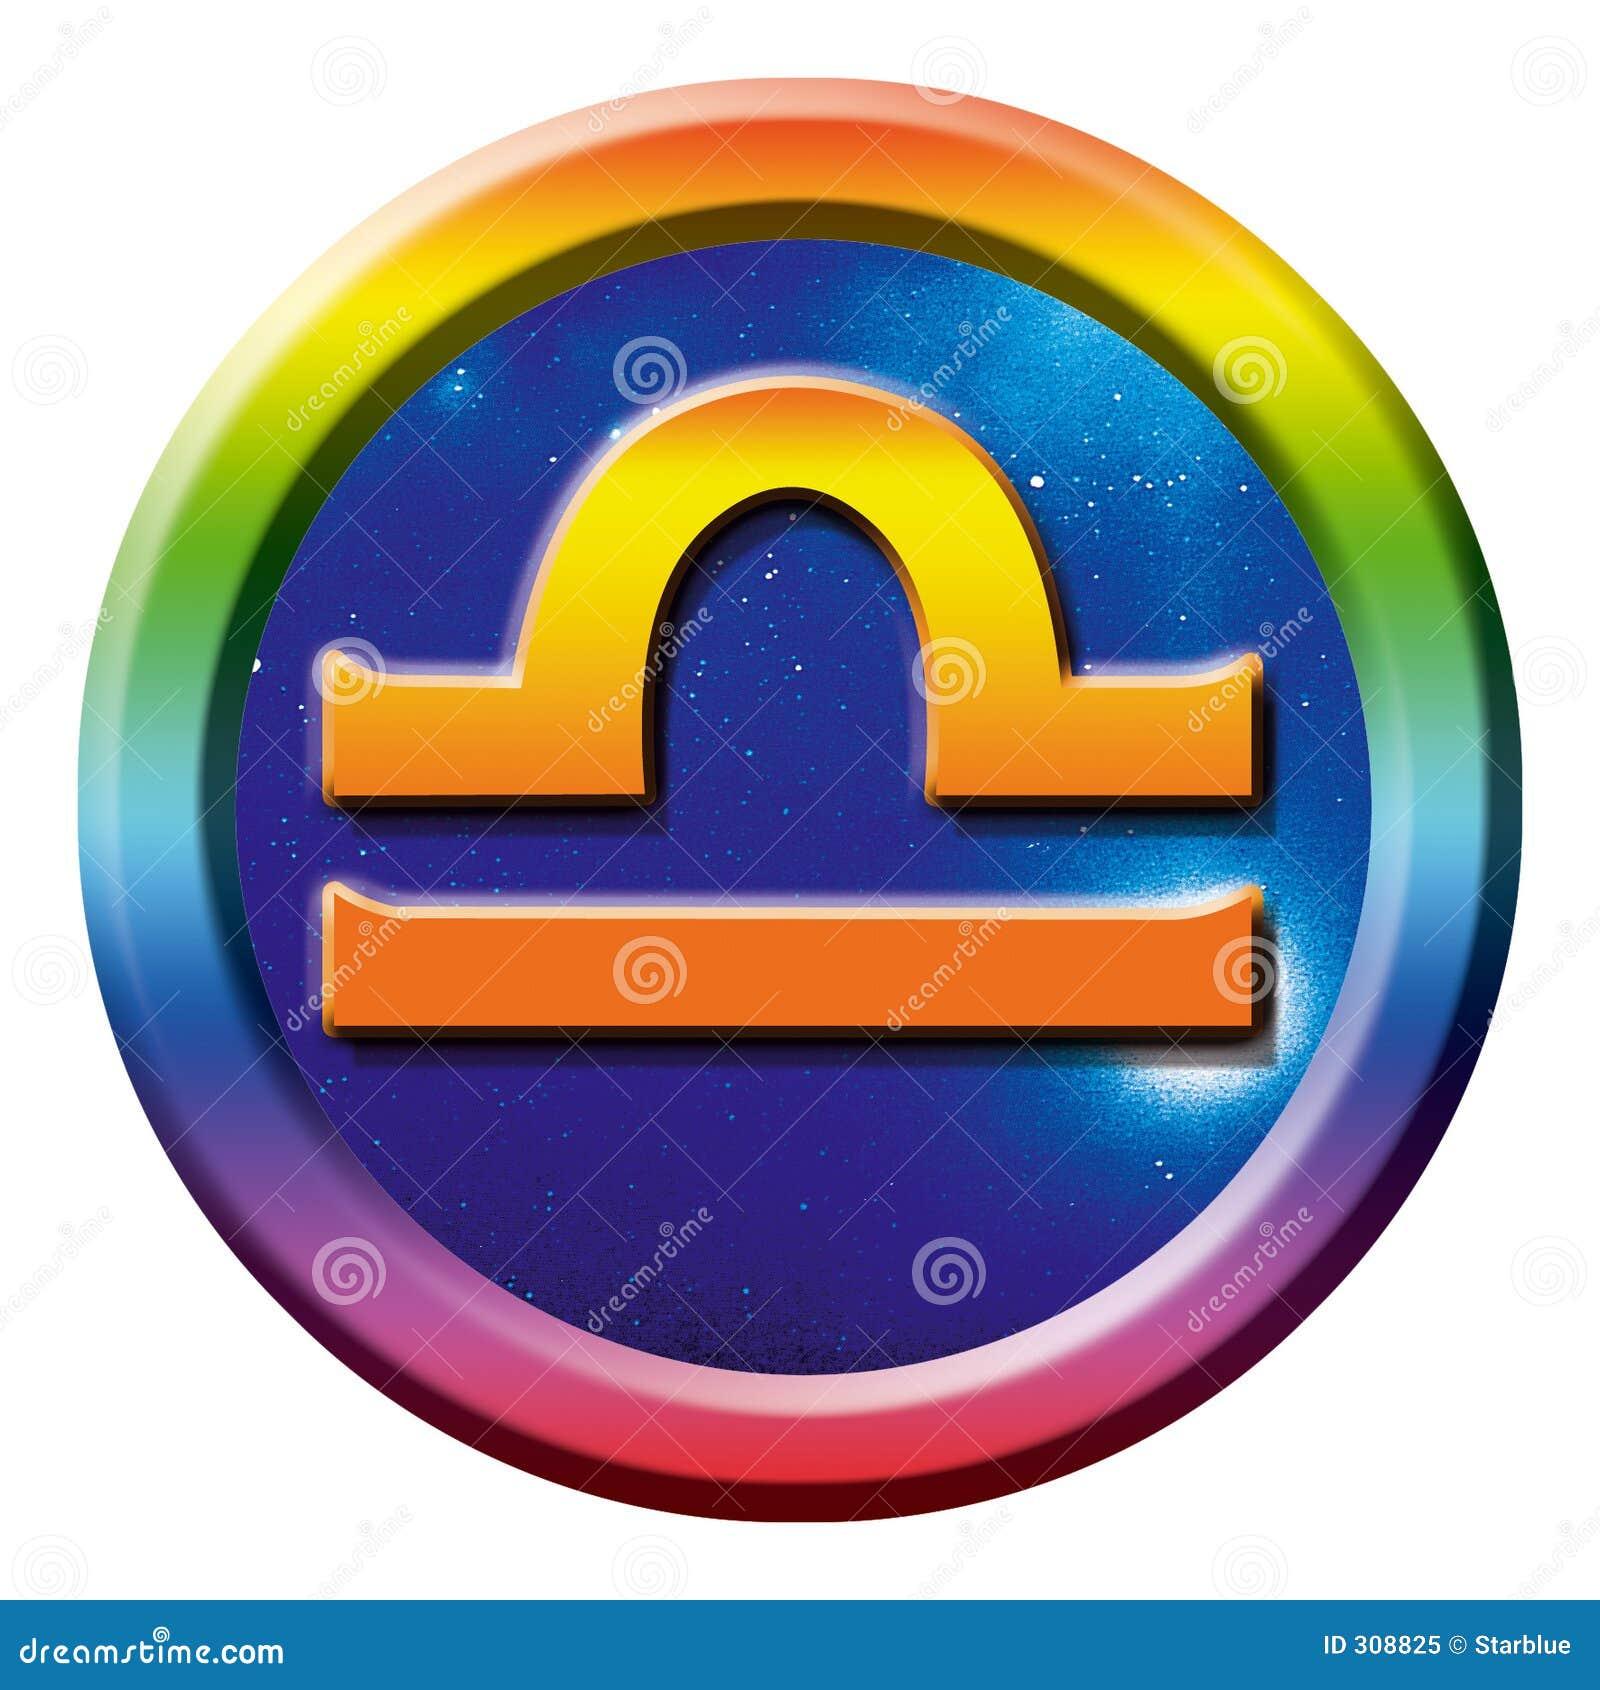 Astrology sign libra